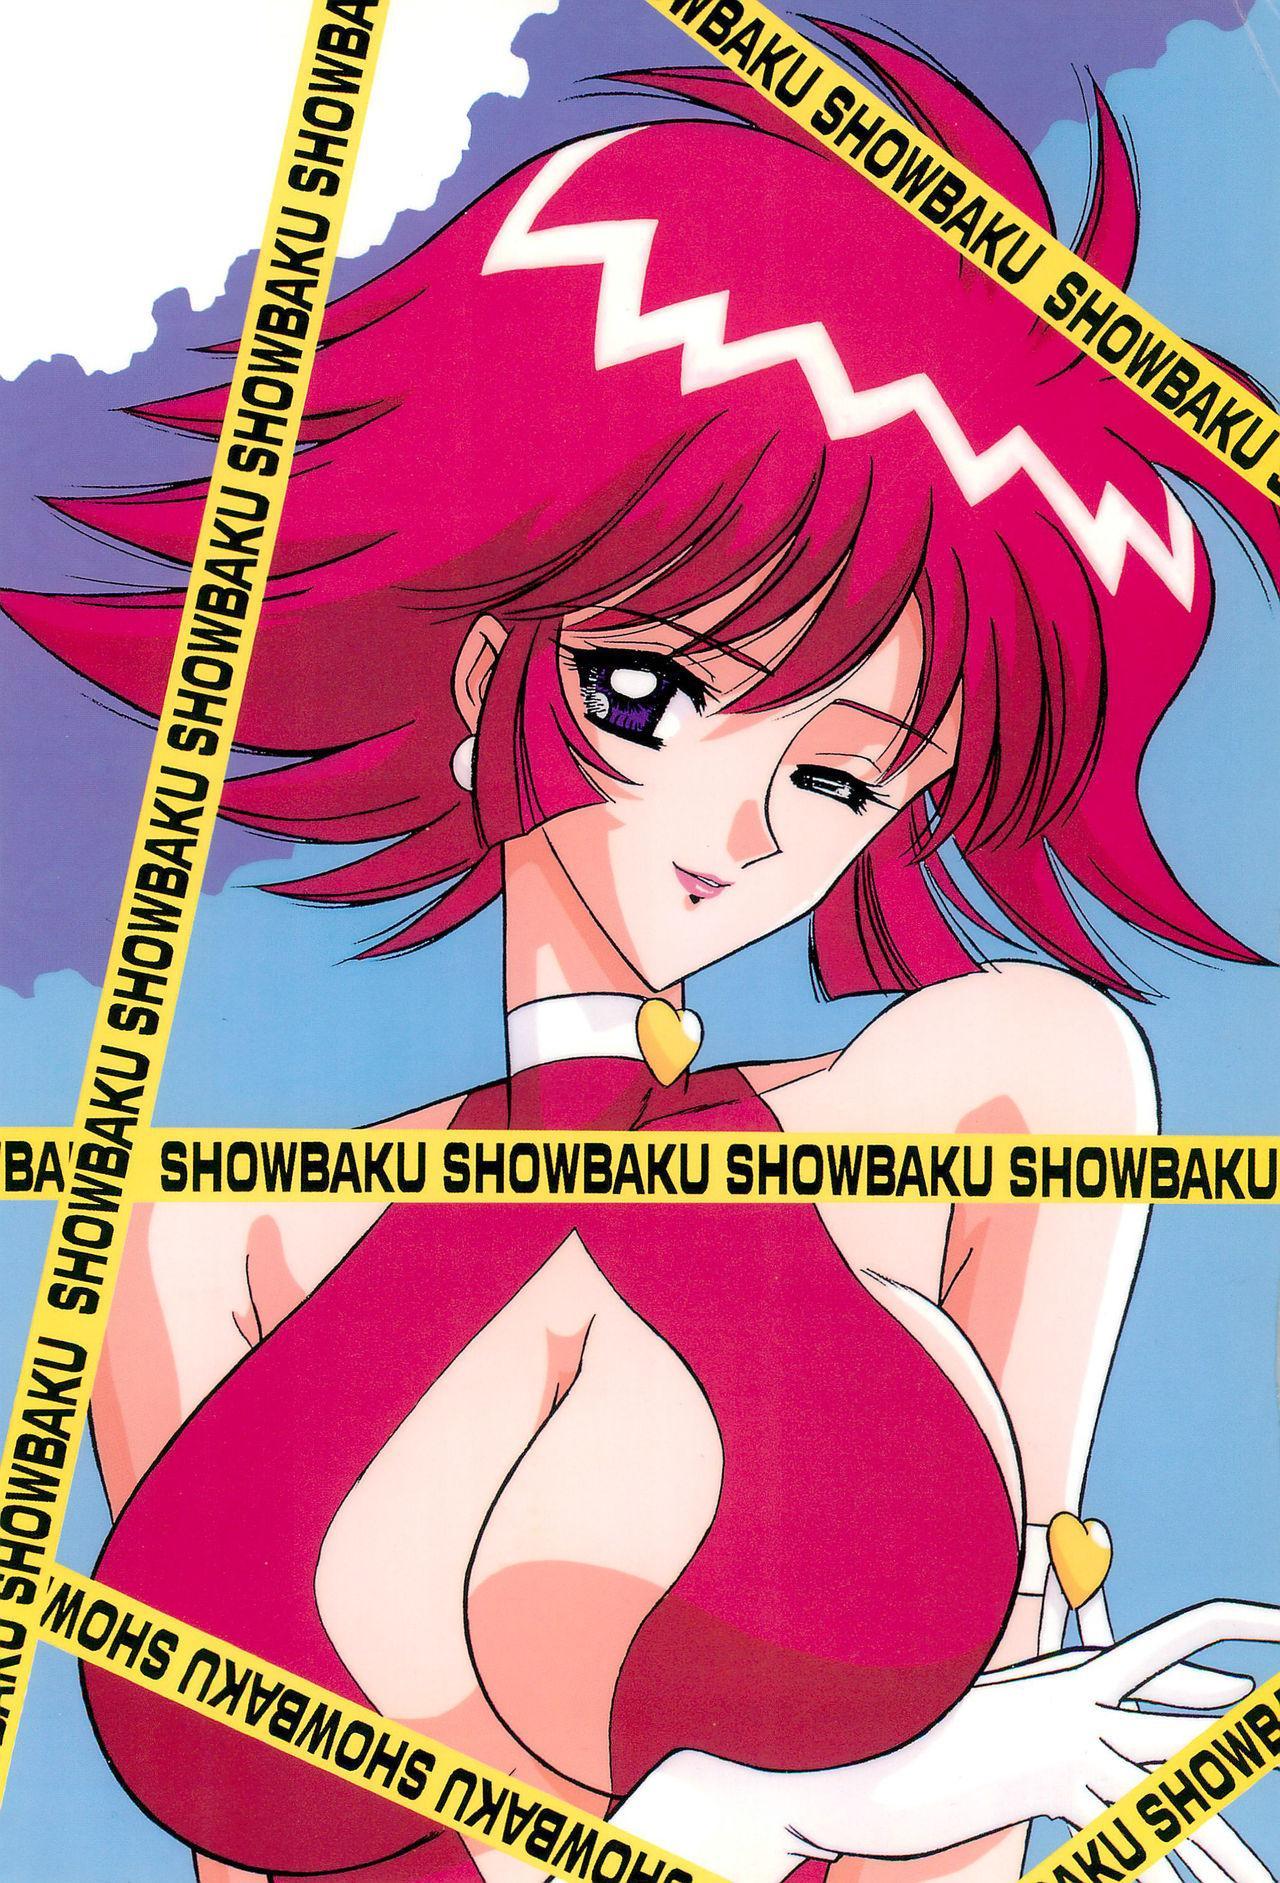 Showbaku 101